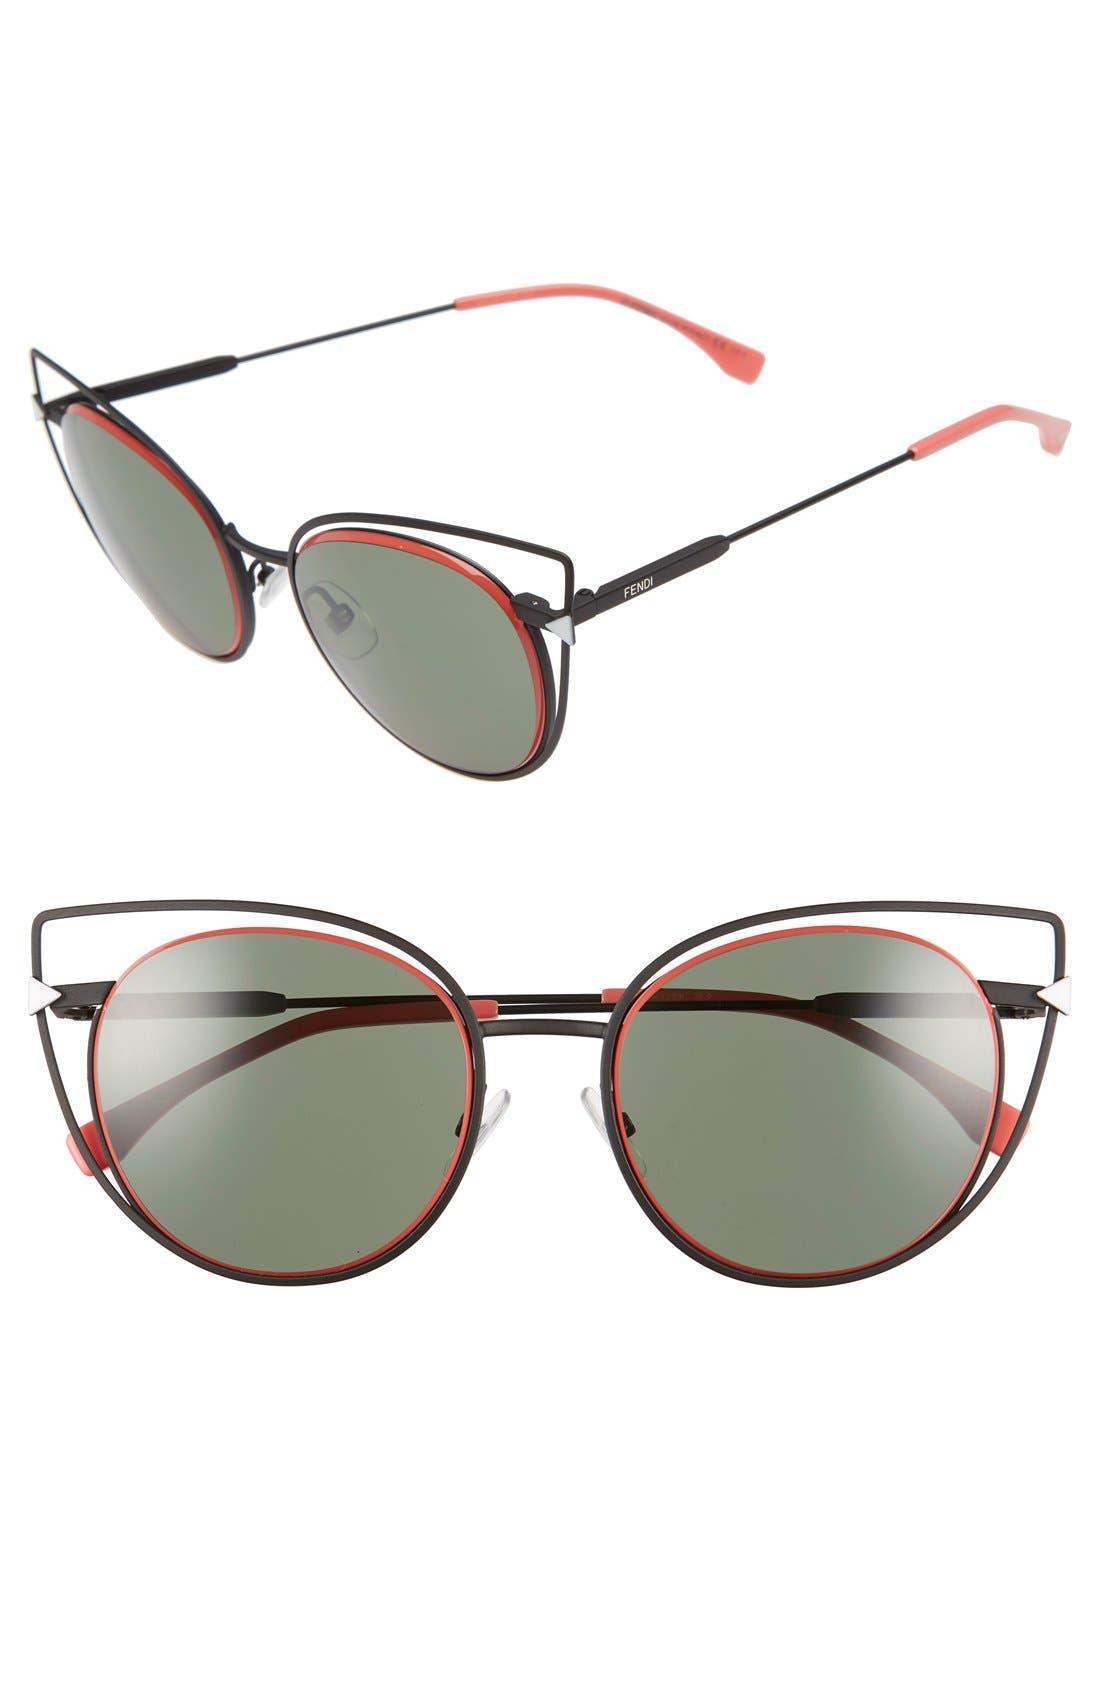 53mm Sunglasses,                             Main thumbnail 1, color,